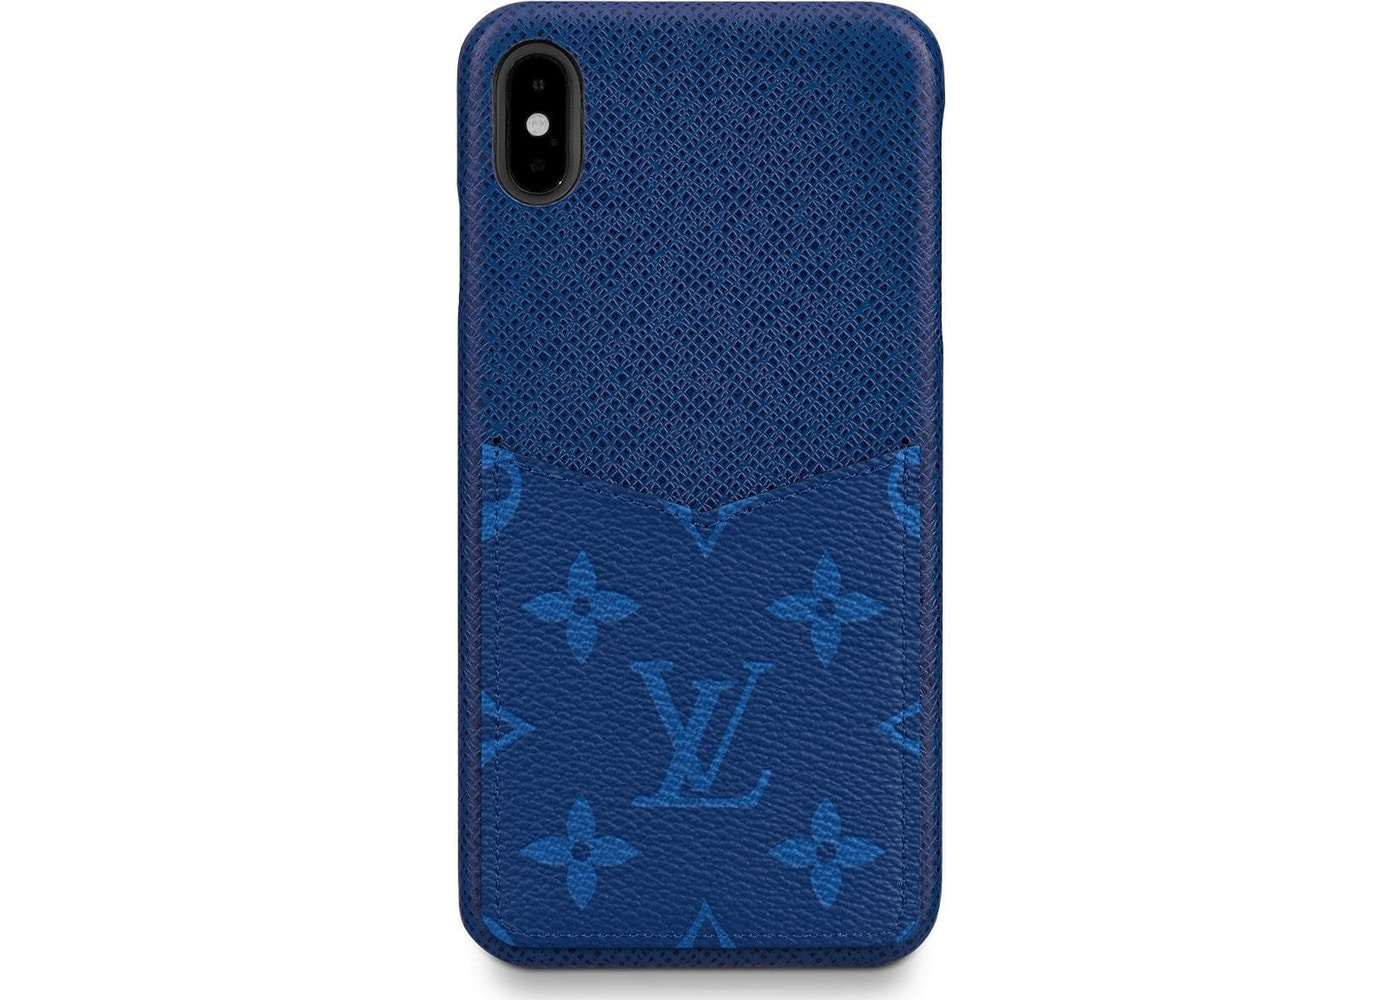 premium selection 0f63b 9c40b Louis Vuitton iPhone Case Monogram Pacific Taiga XS MAX Blue